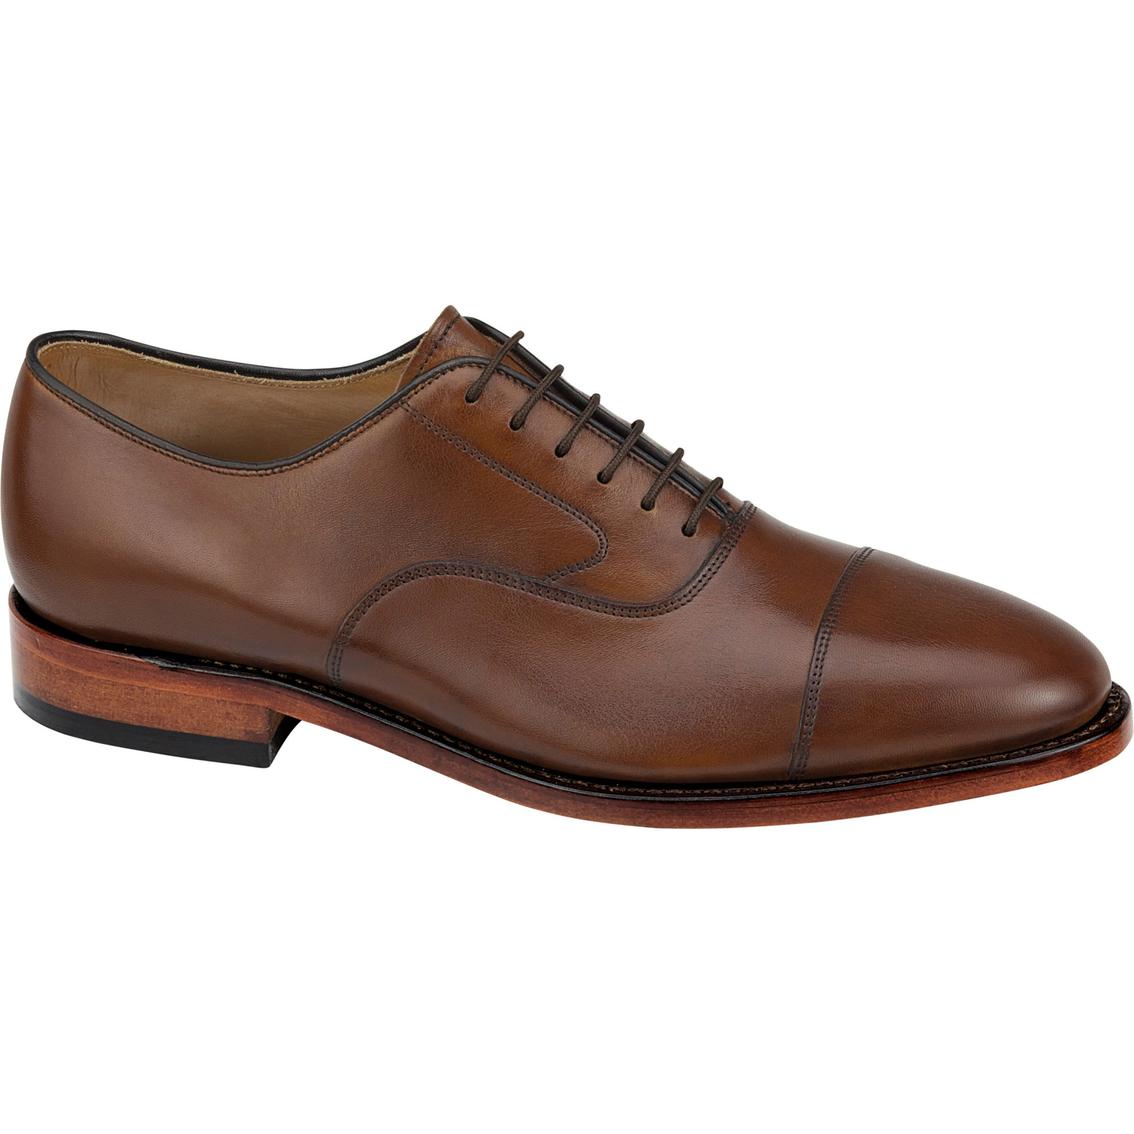 Johnston Amp Murphy Men S Melton Cap Toe Oxford Shoes